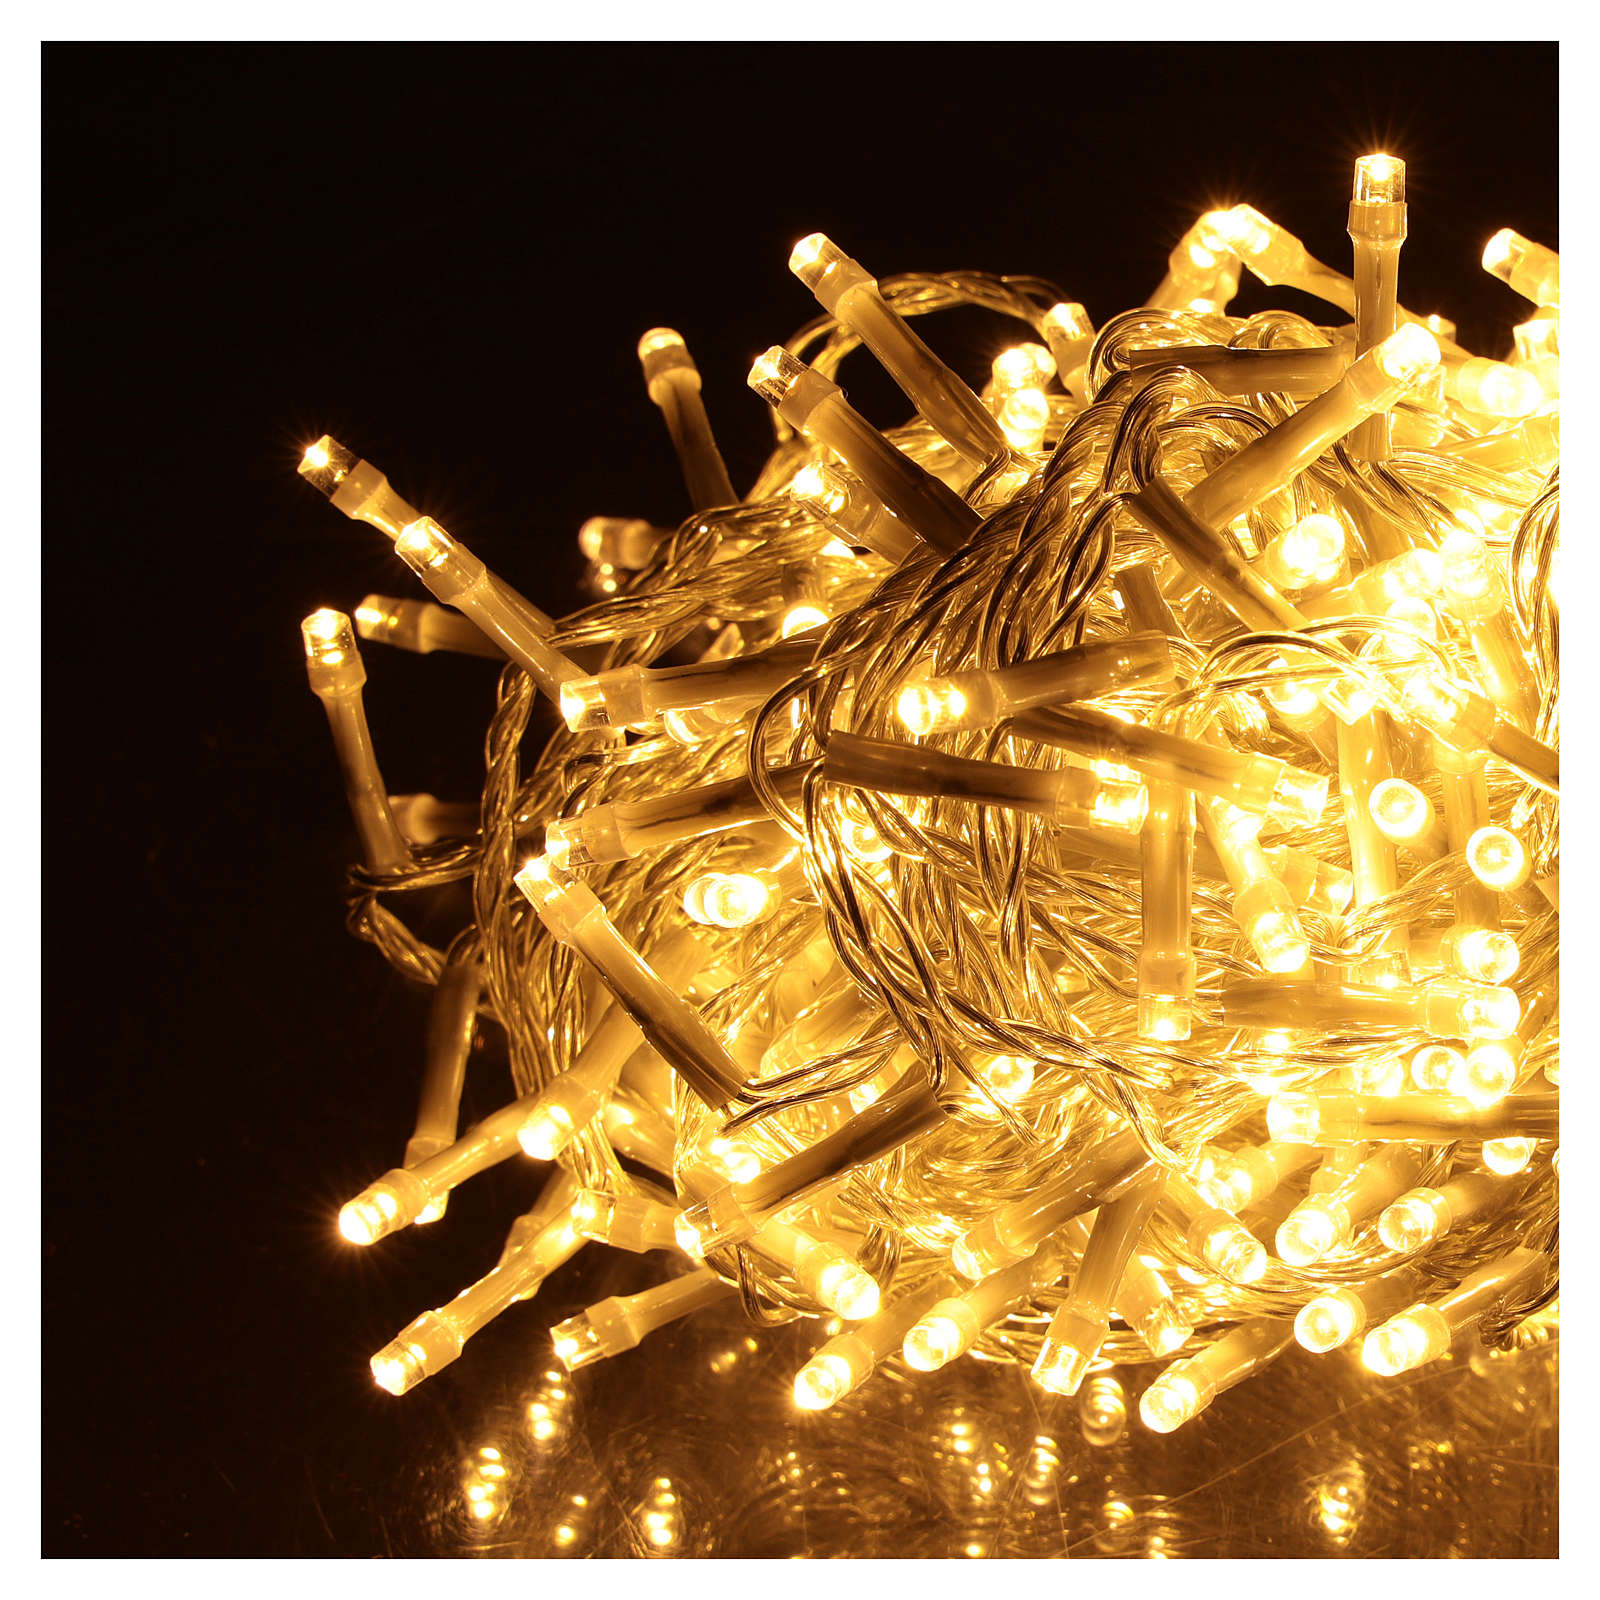 Cadena luminosa Navideña 500 led blanco cálido para exterior 3